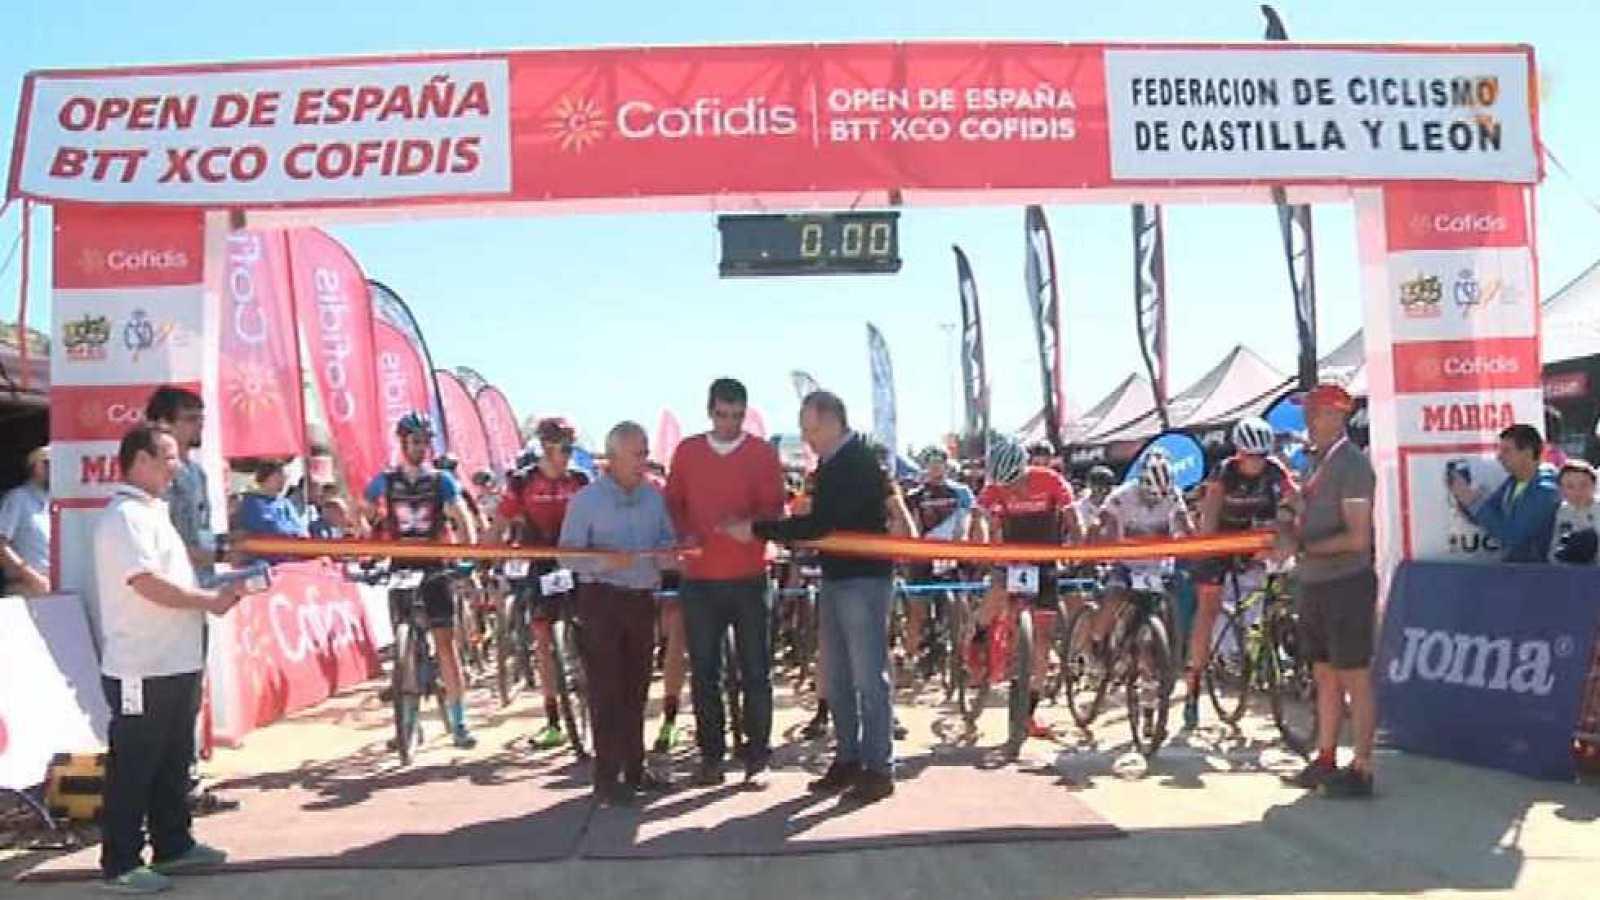 Circuito Xco Moralzarzal : Mountain bike open de españa btt xco 2017. prueba valladolid rtve.es